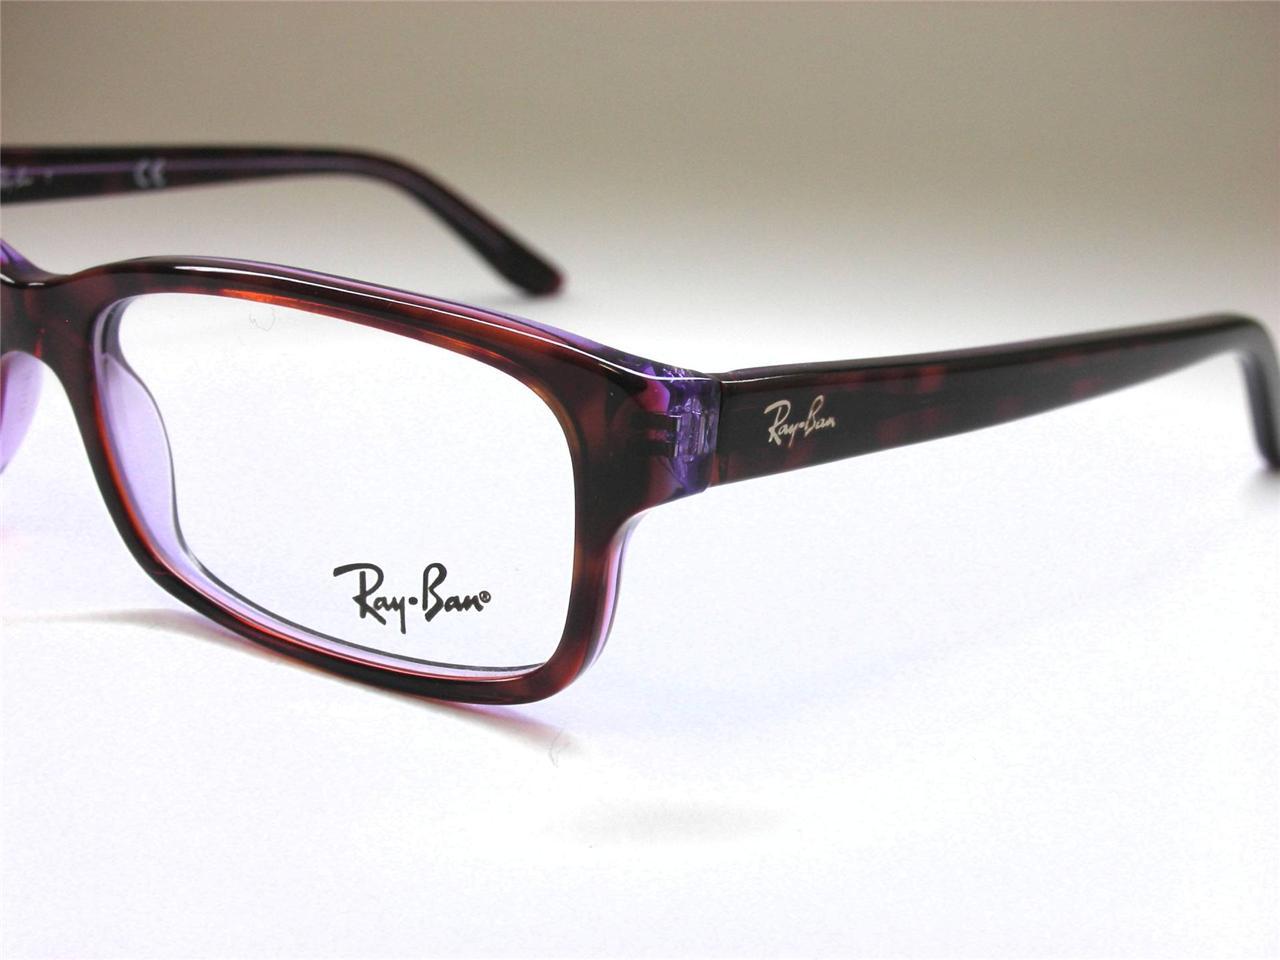 Ray Ban Rb 5187 Highstreet 2442 x6BlXF